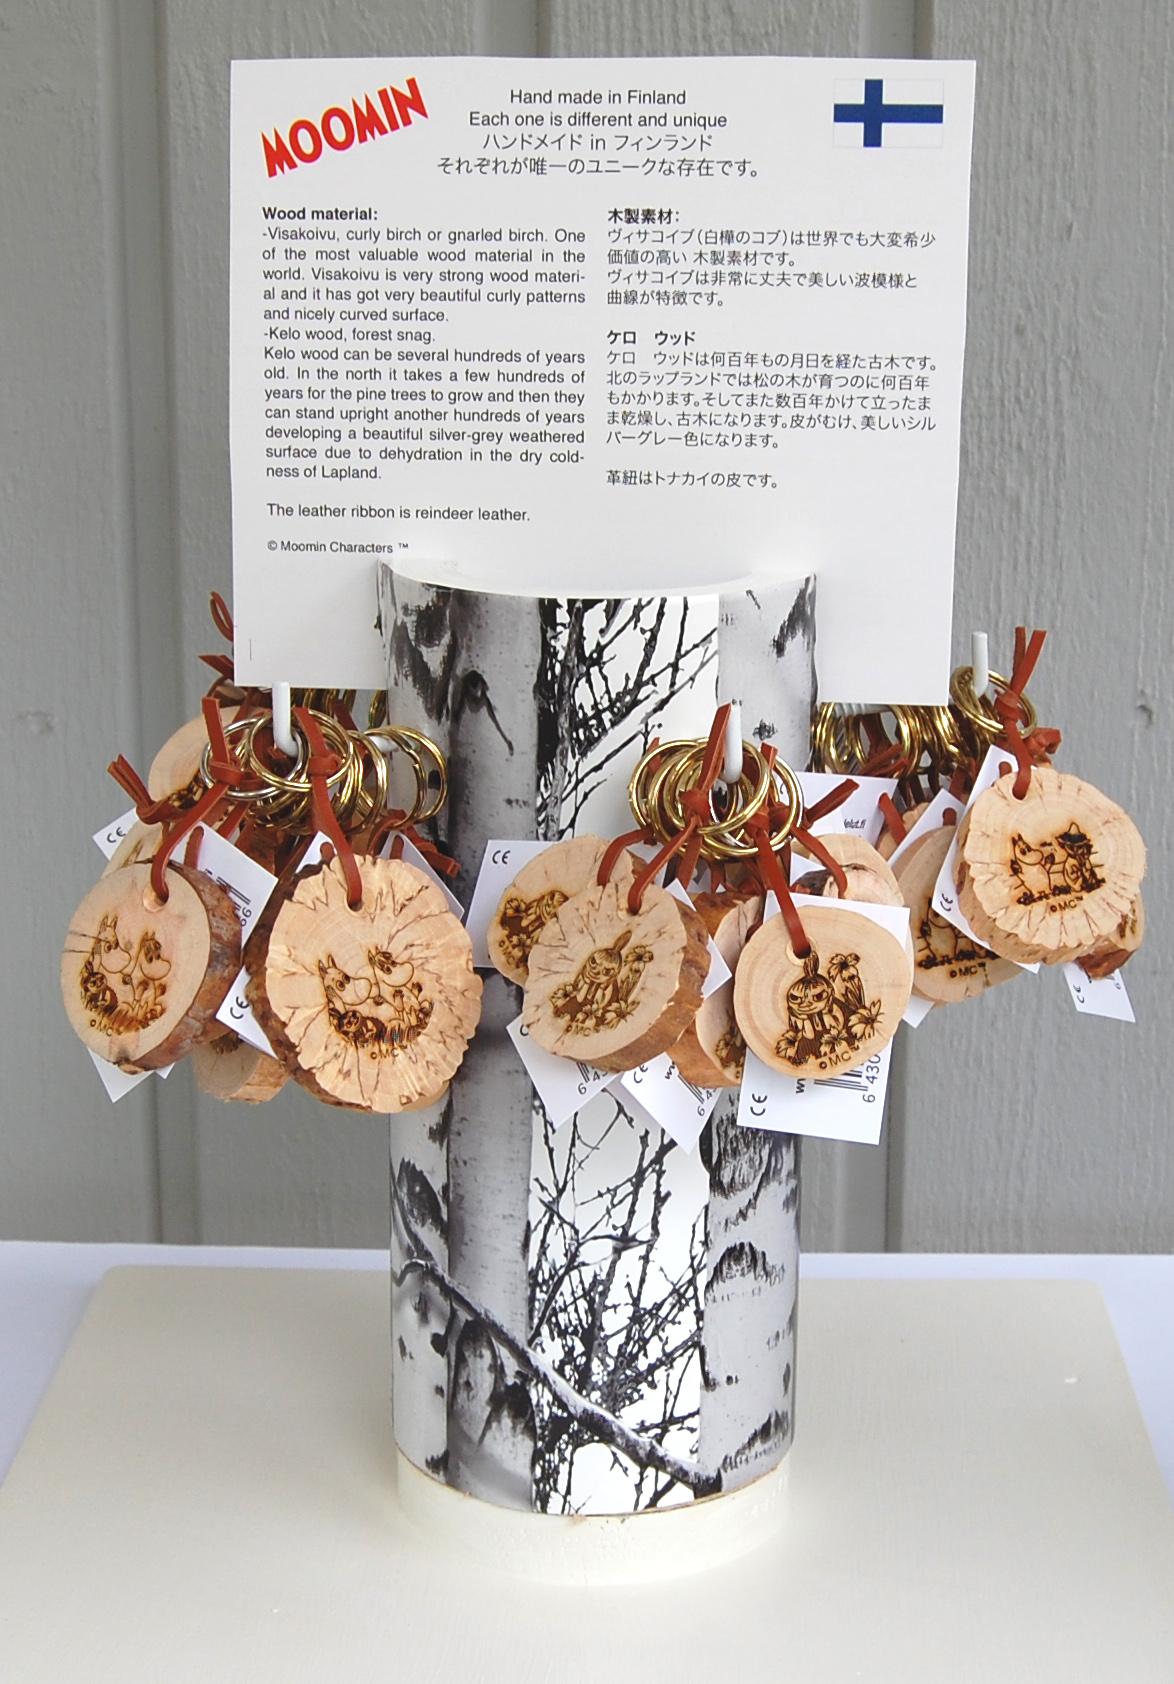 Isoisän Puulelut Display for the new Moomin key rings